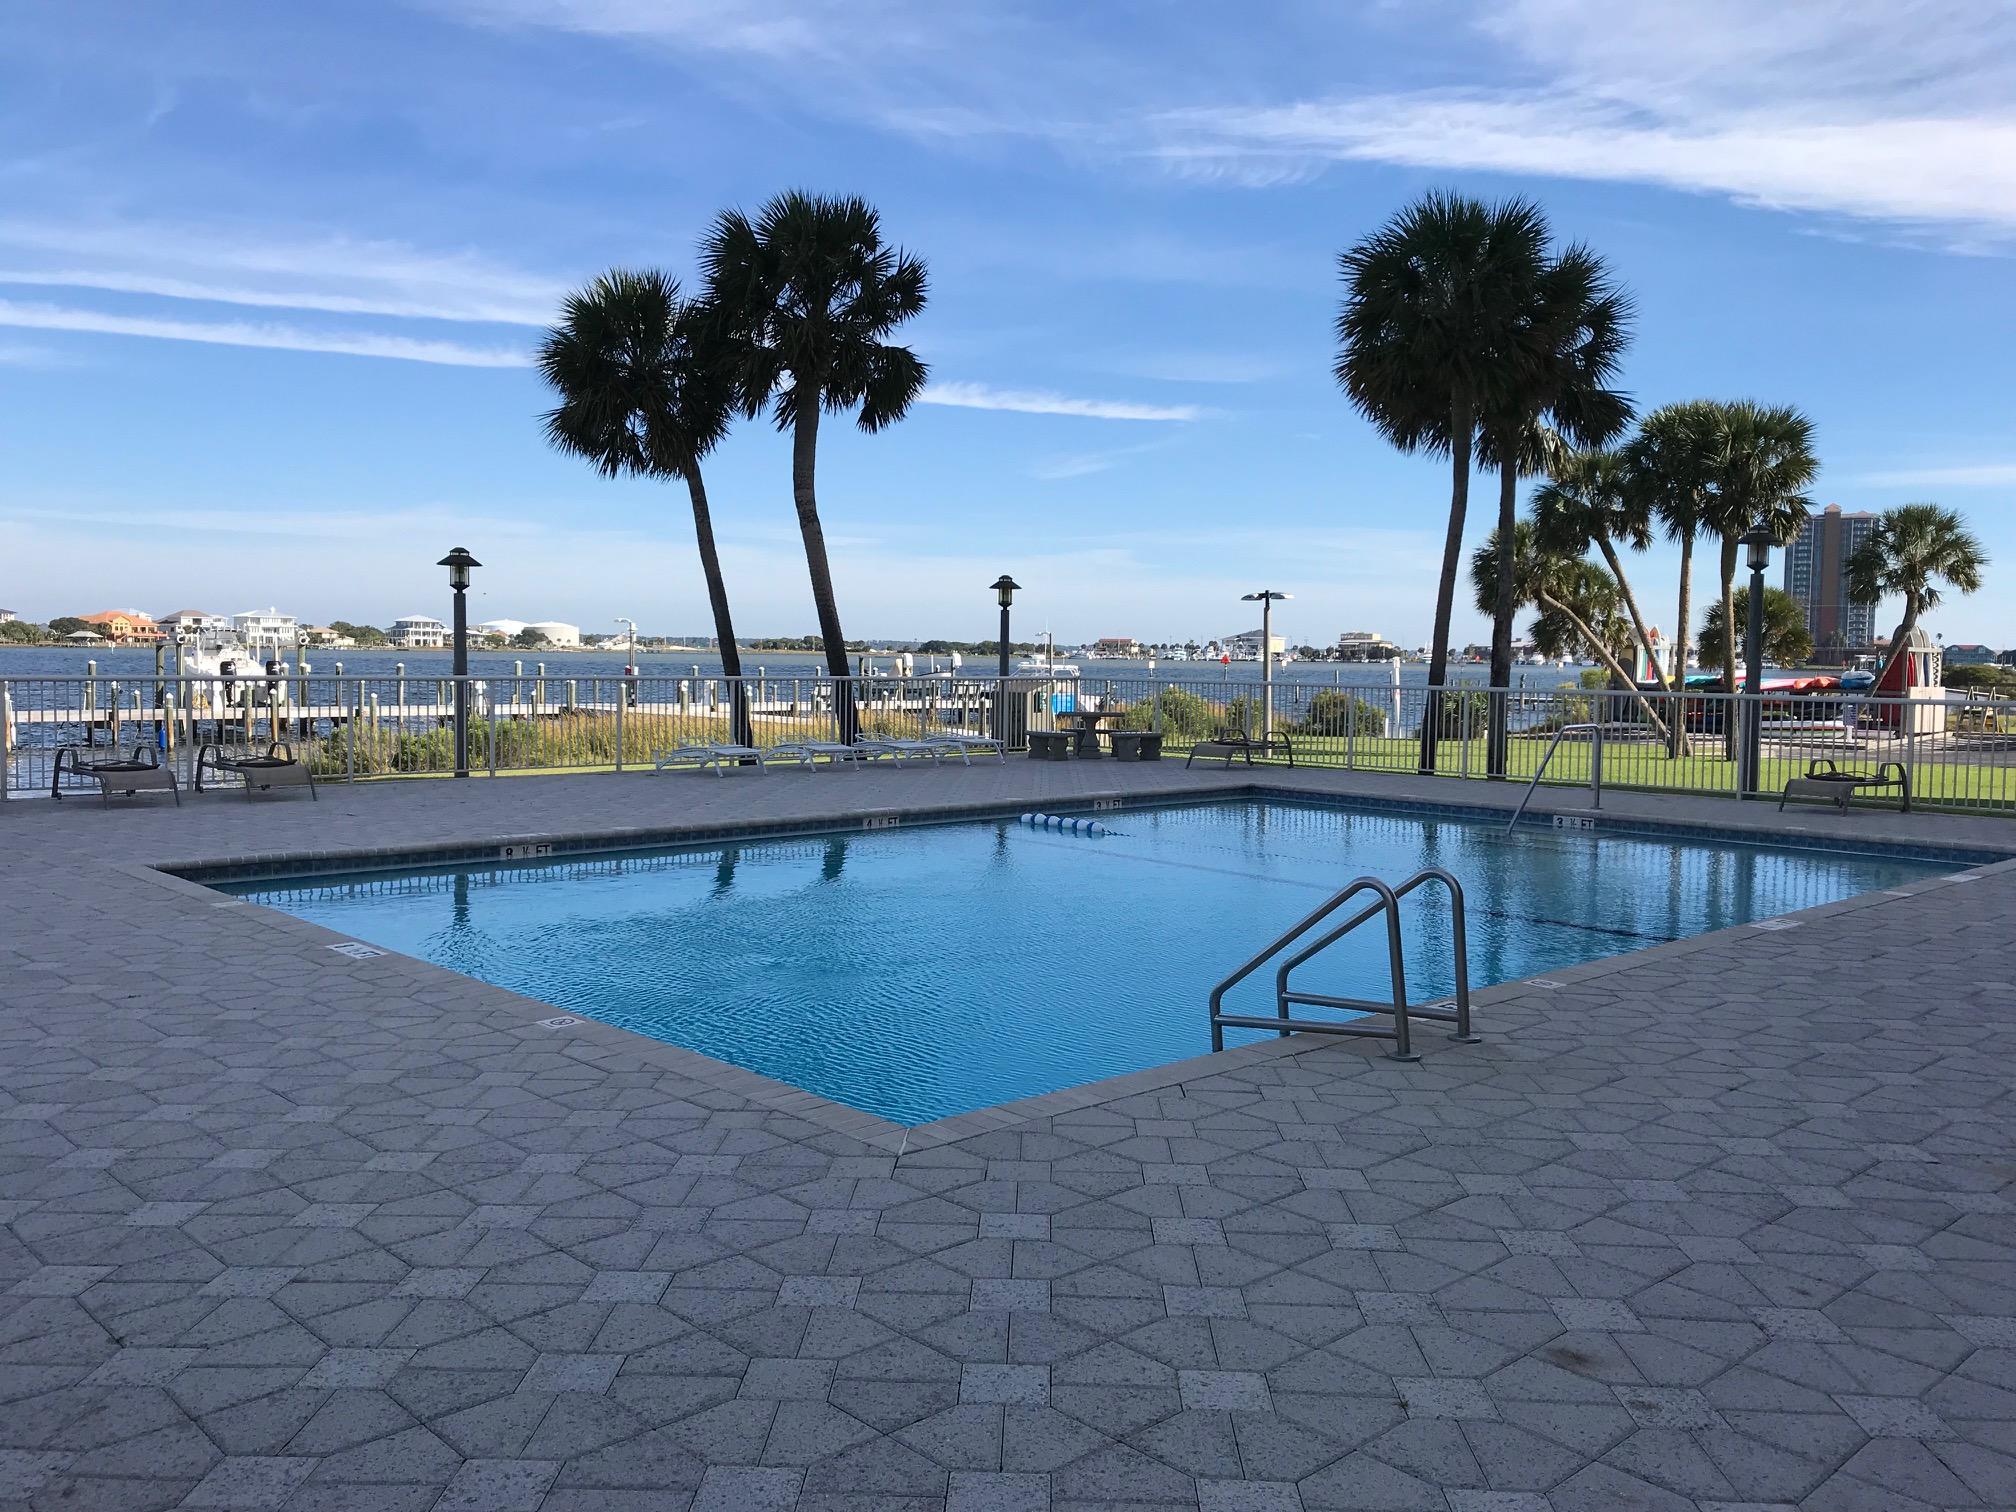 Sabine Yacht & Racquet Club #9D Condo rental in Sabine Yacht & Racquet Club ~ Pensacola Beach Condo Rentals by BeachGuide in Pensacola Beach Florida - #24